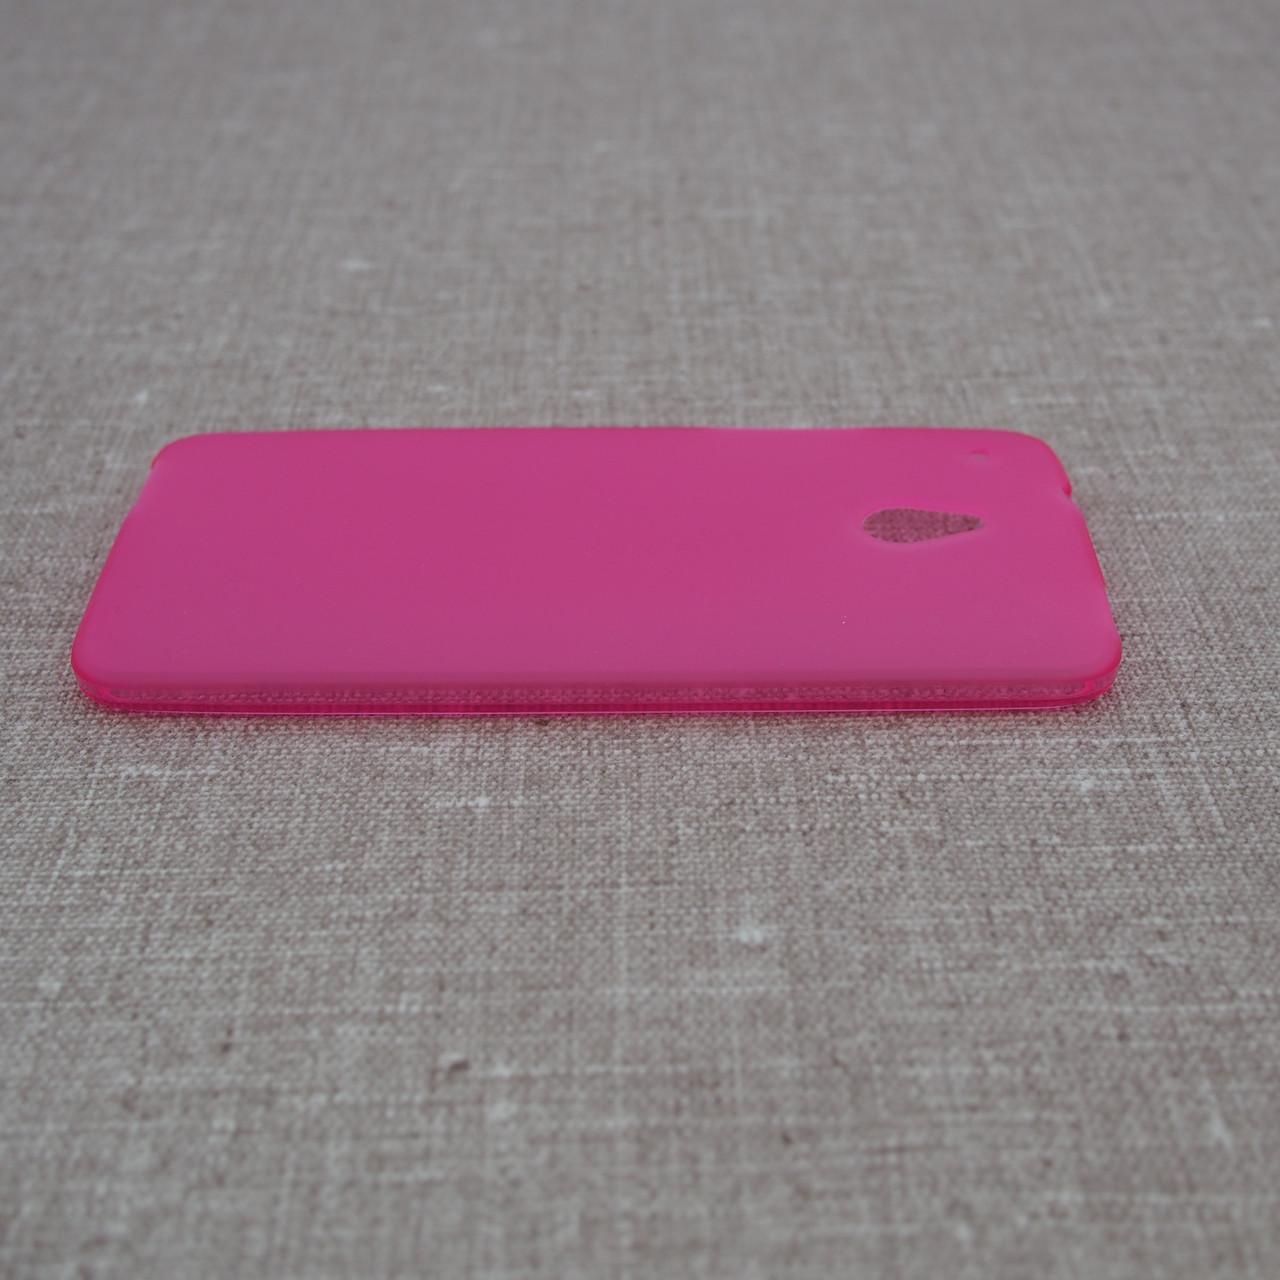 Чехол TPU HTC One mini M4 pink Для телефона